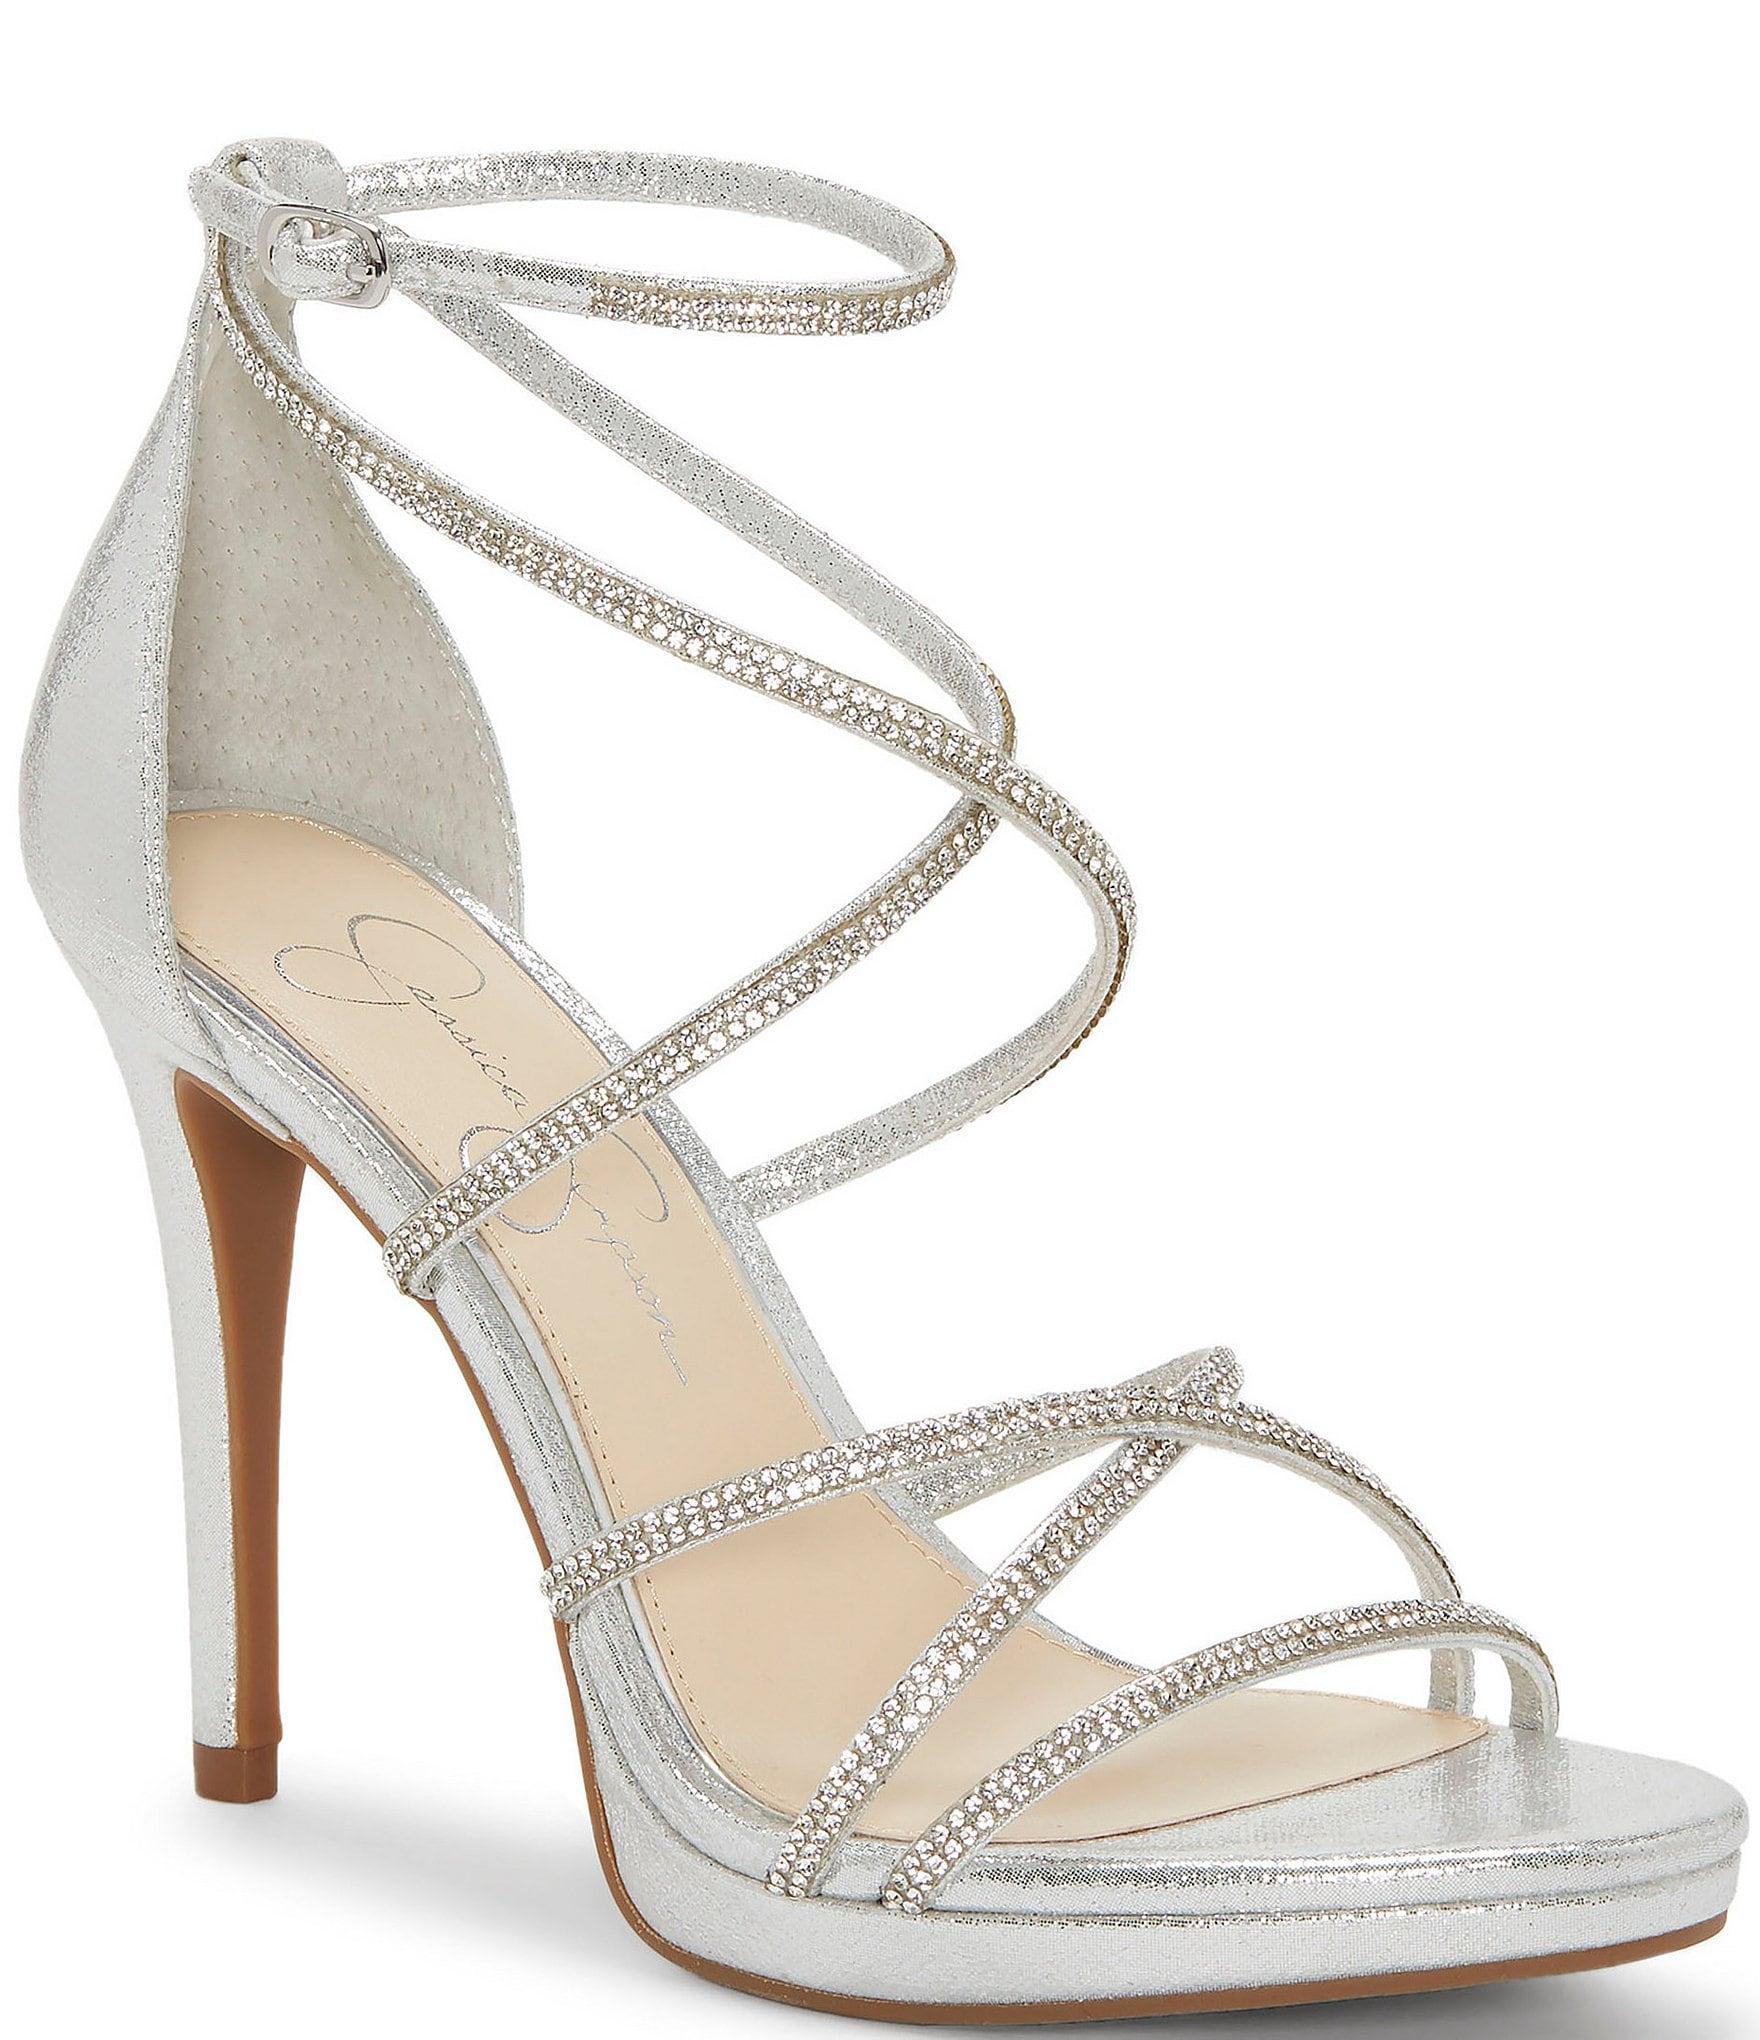 549156c6099 Jessica Simpson Jaeya Rhinestone Strappy Dress Sandals